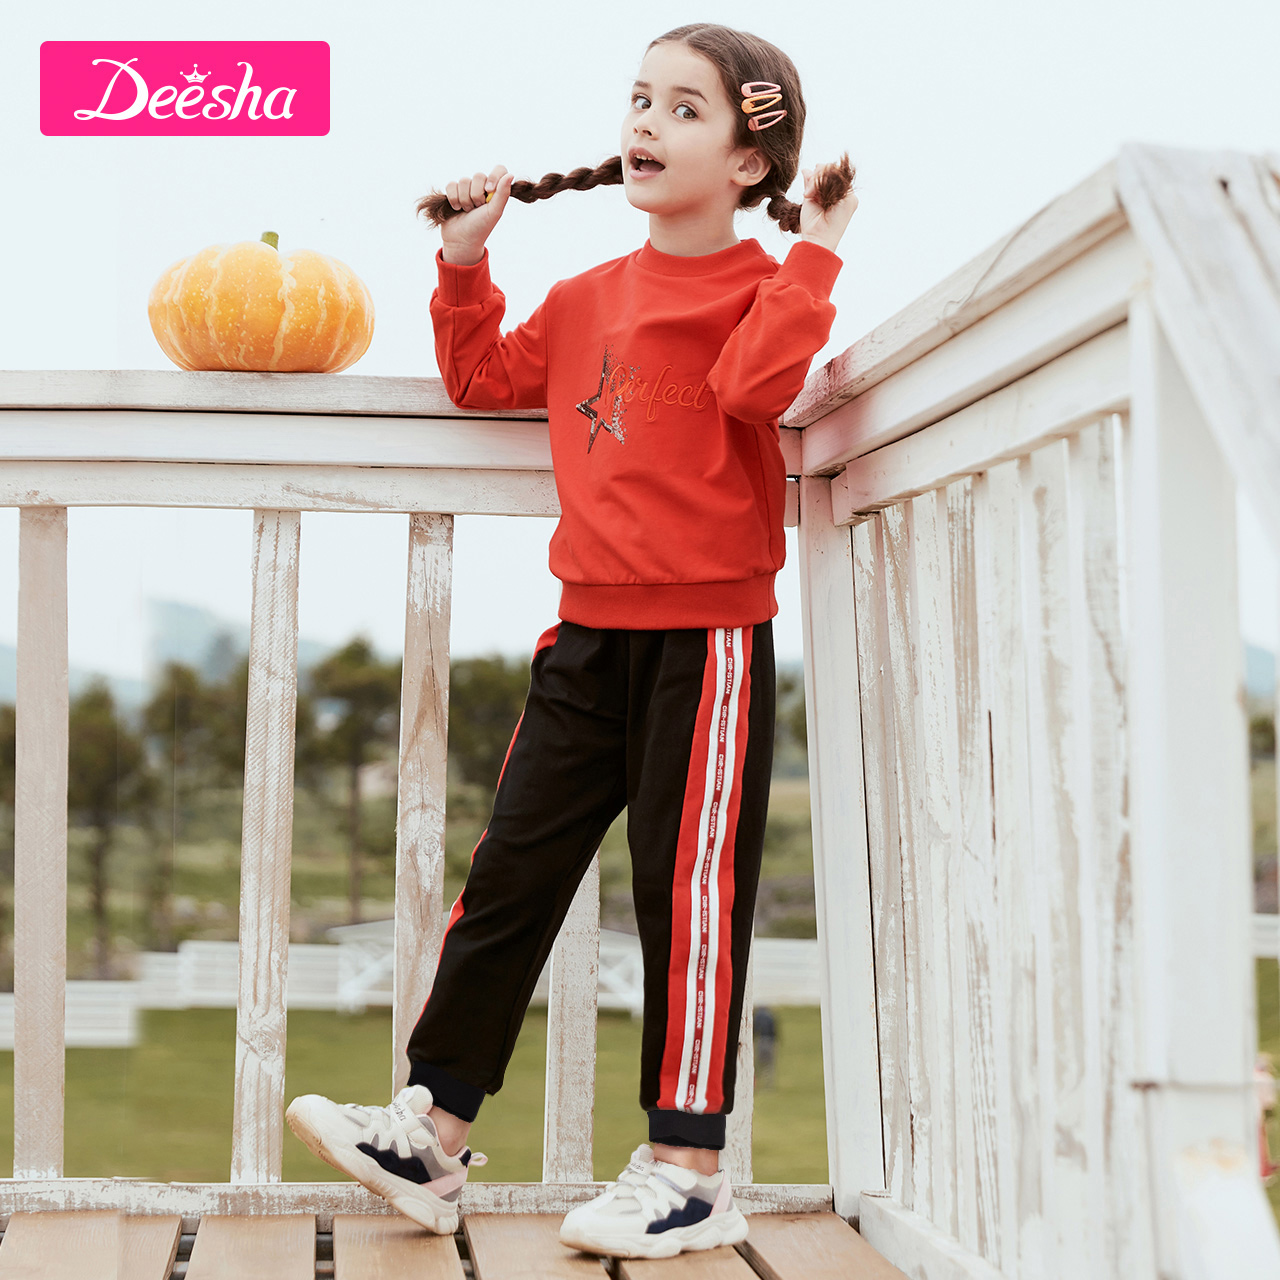 Deesha Mini 笛莎 女童休闲运动套装两件套 天猫优惠券折后¥69包邮(¥119-50)90~165码多色可选